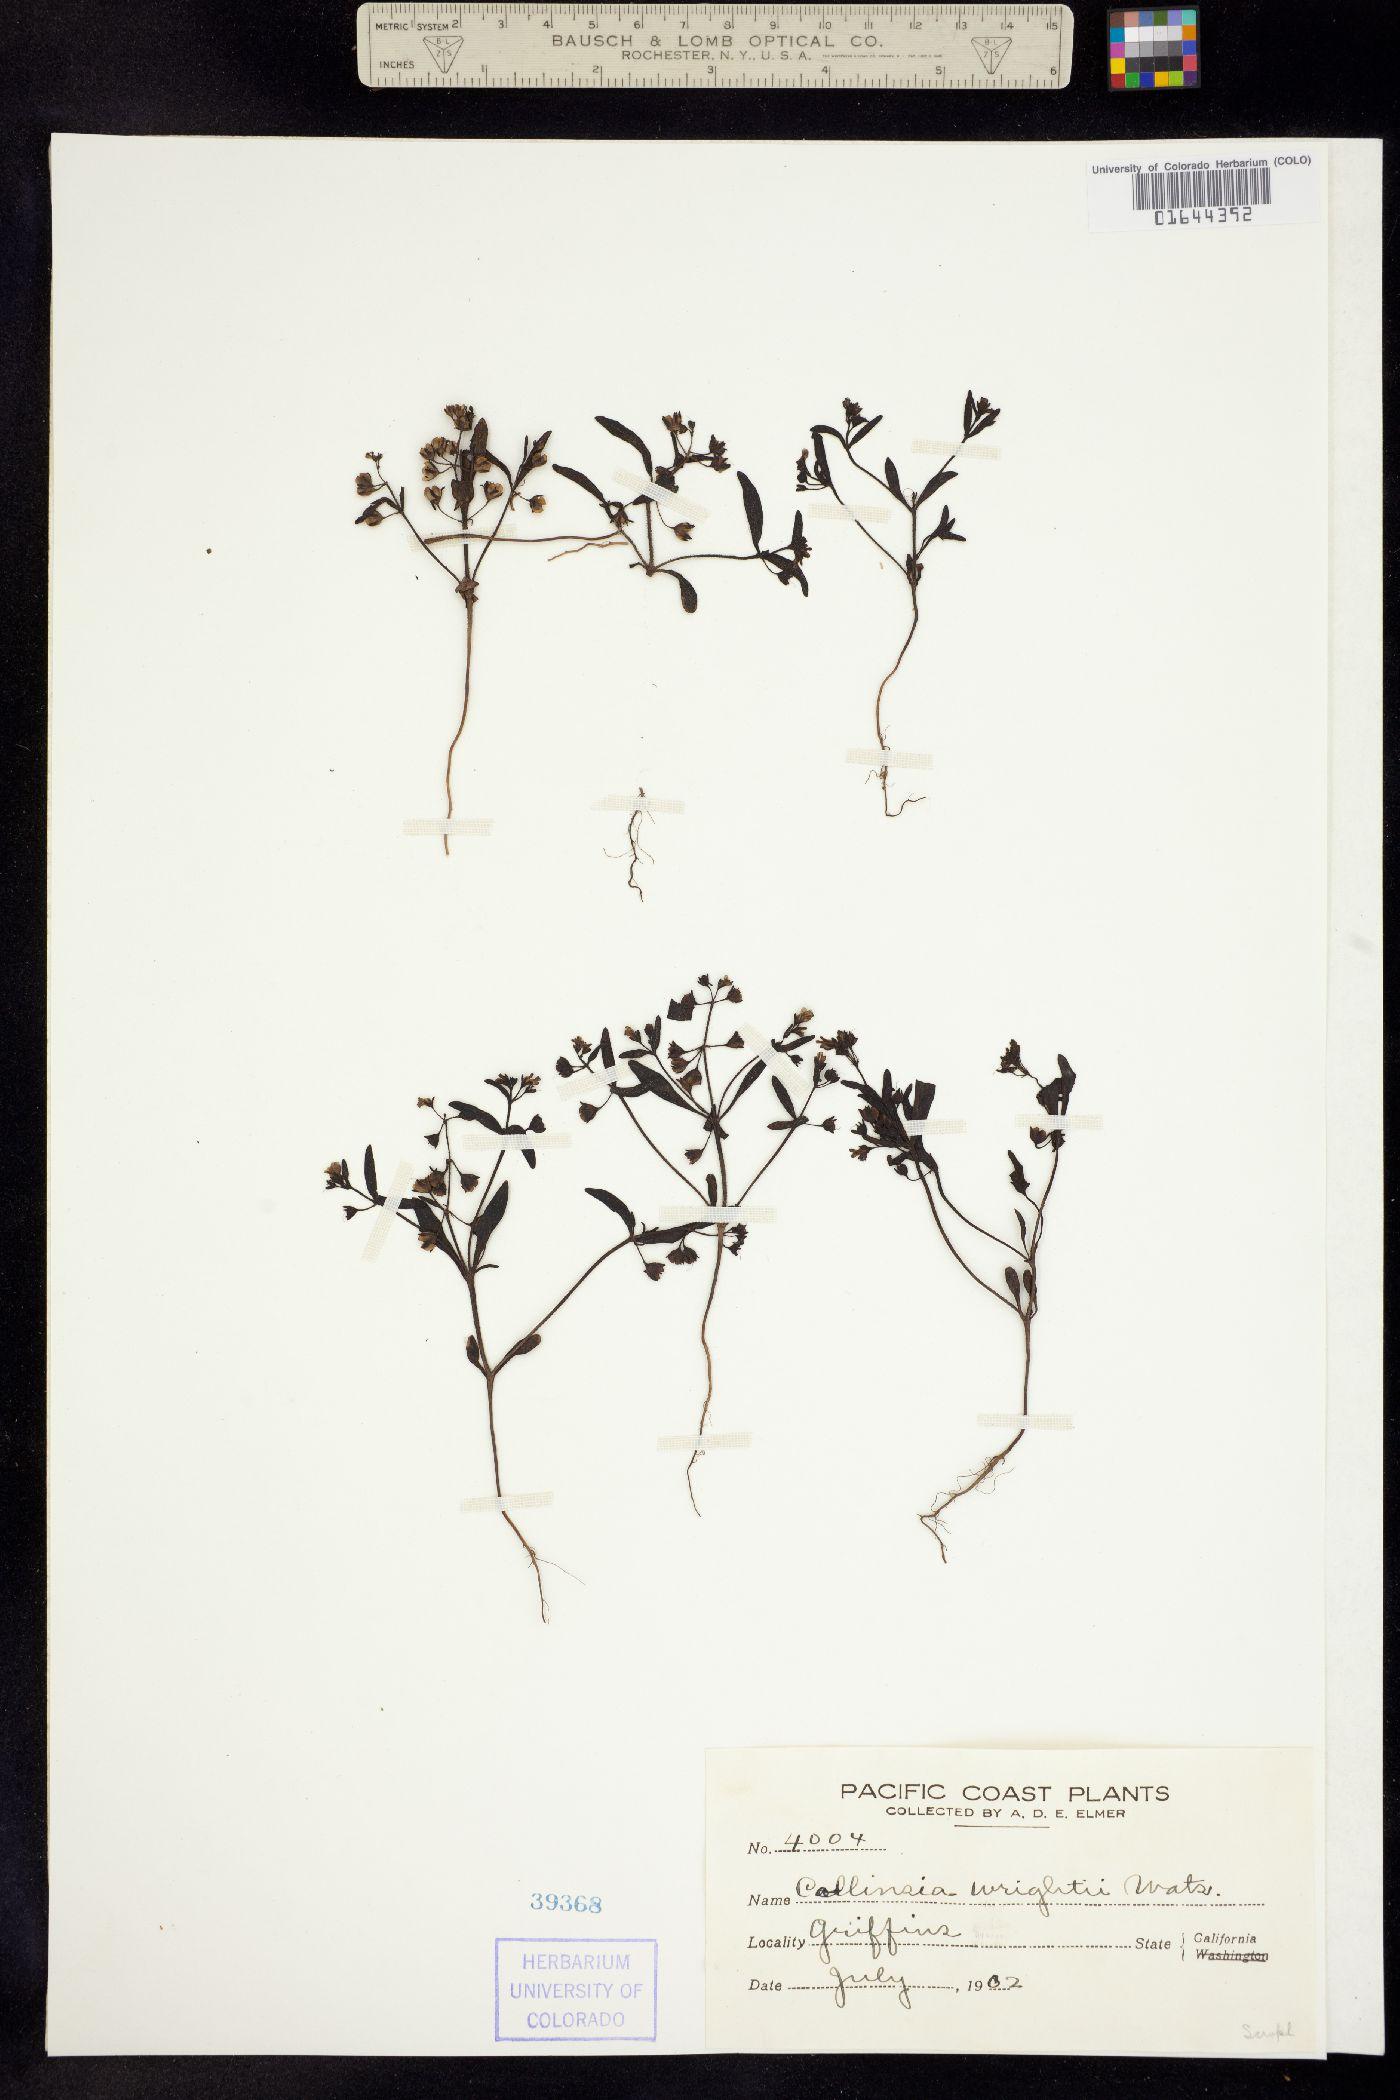 Collinsia wrightii image